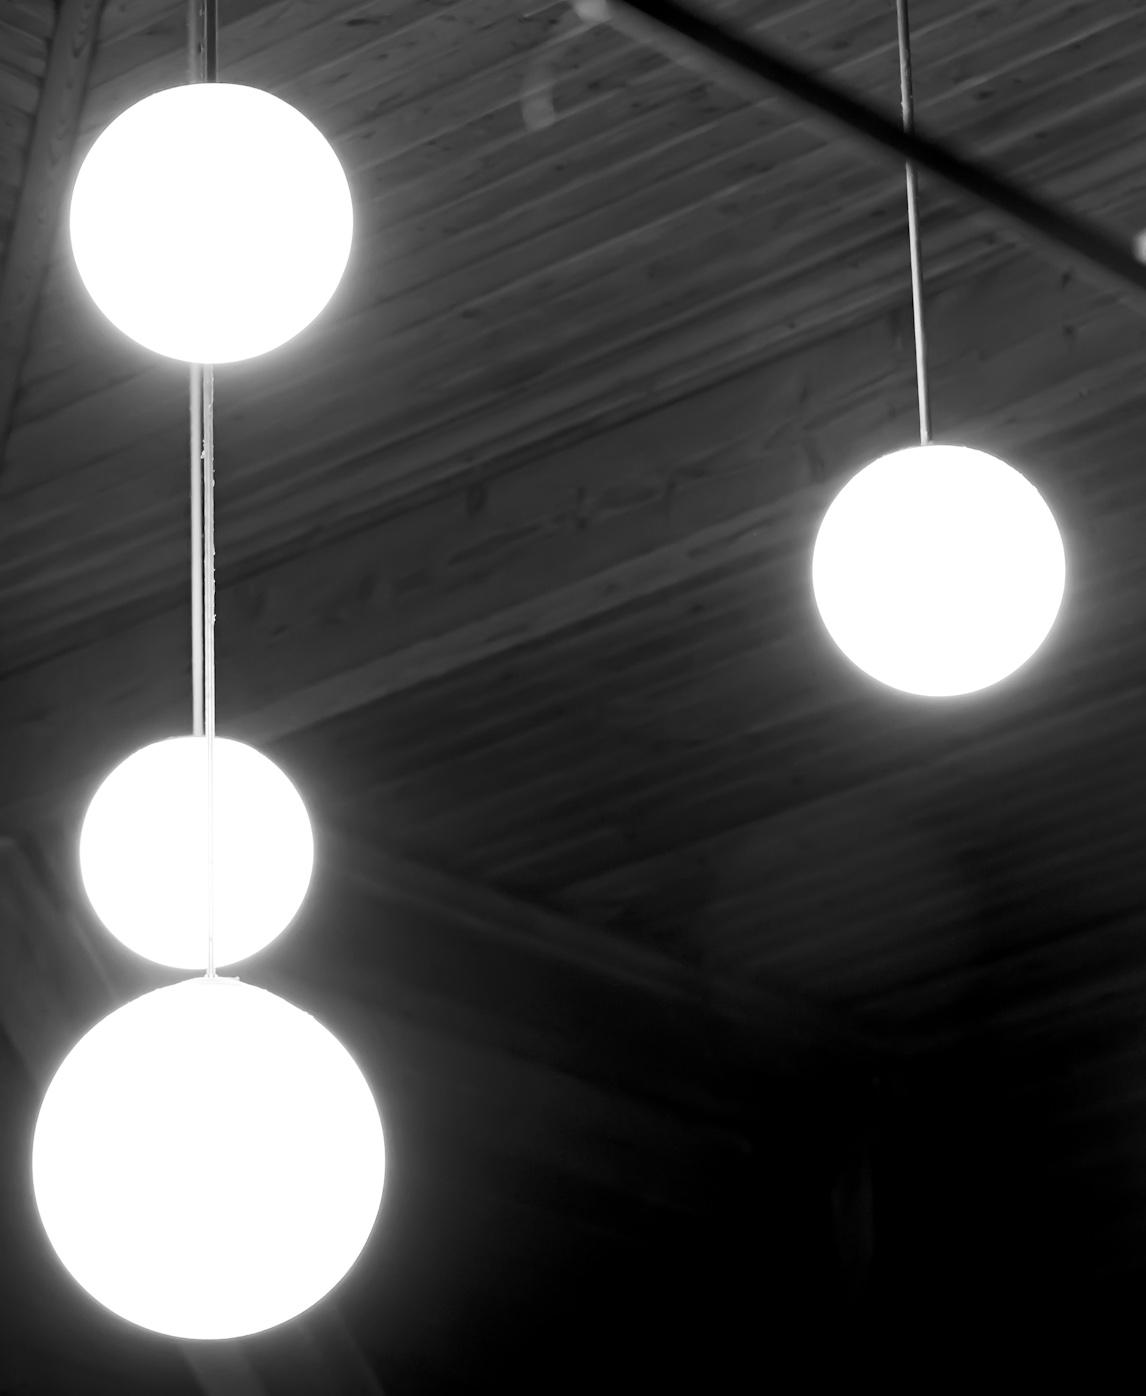 the lights, photo 192064, 2012-03-24